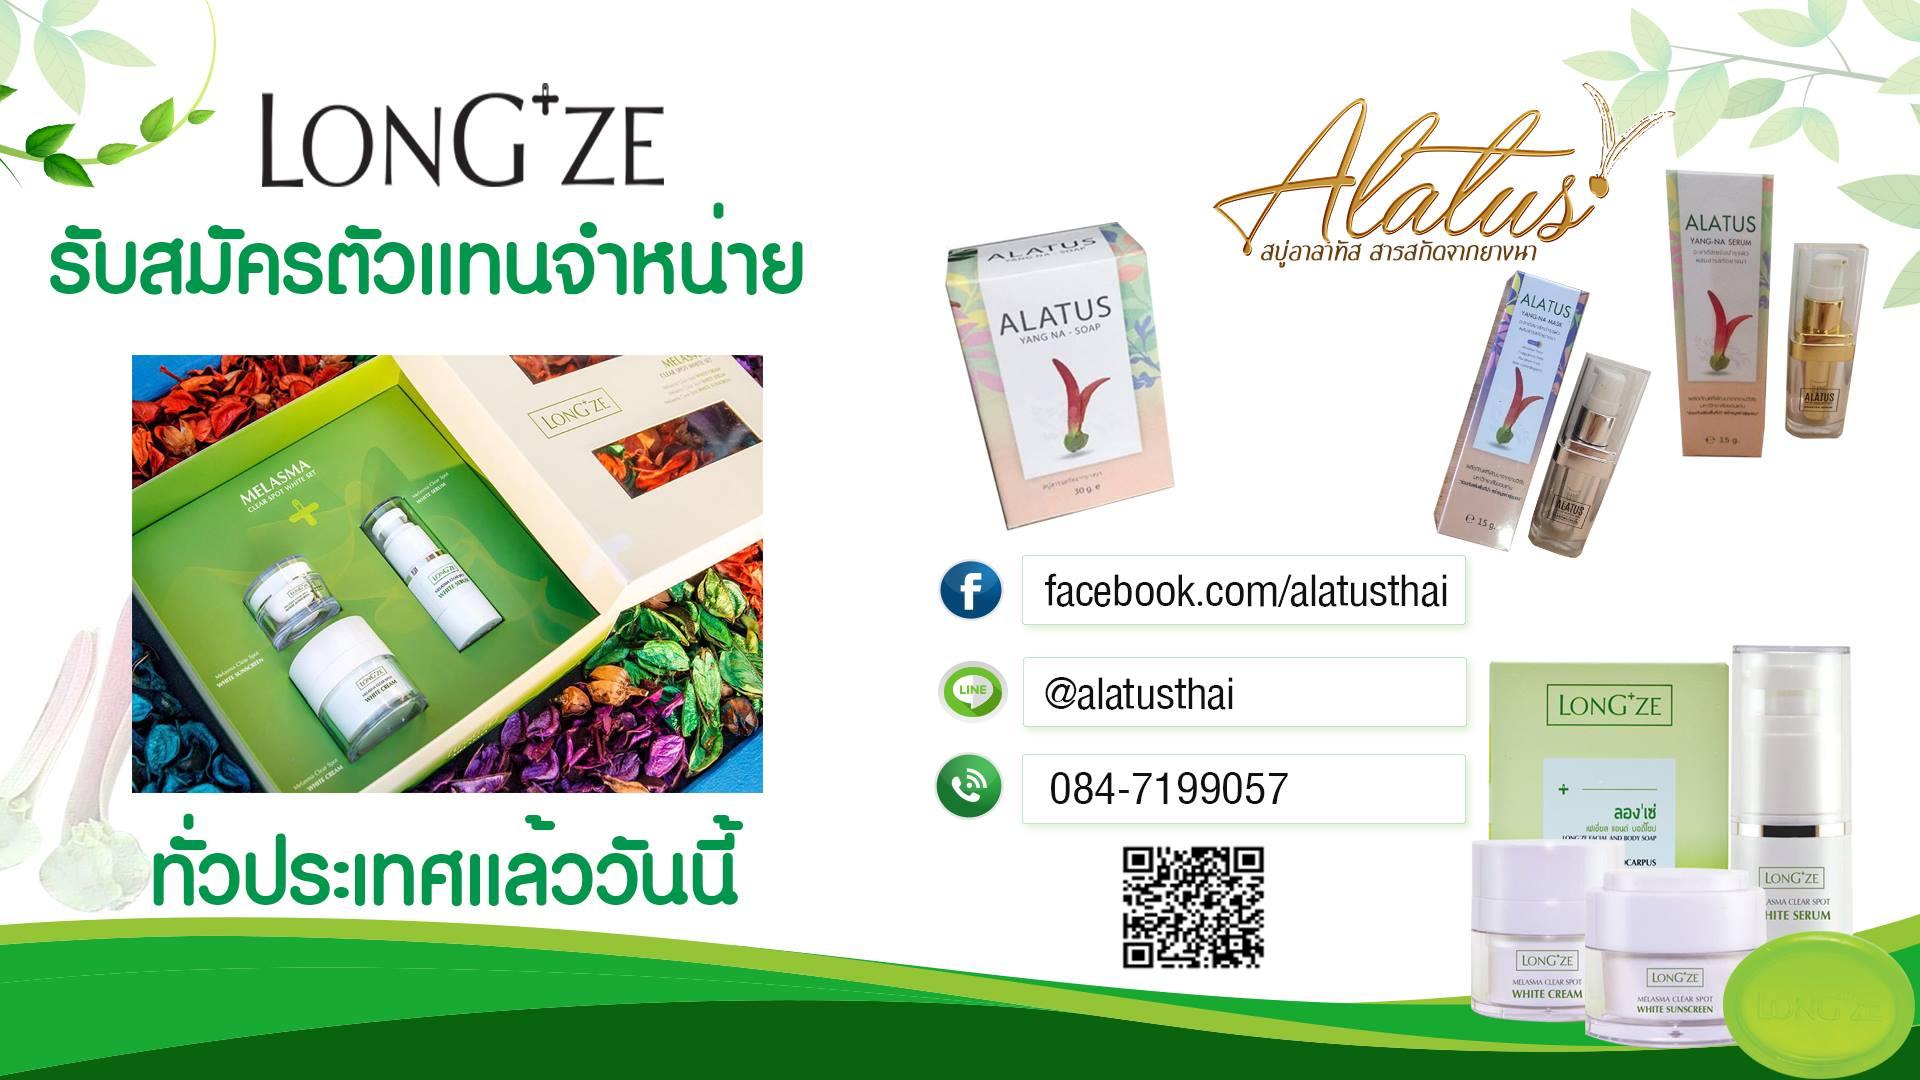 AlatusThai จำหน่ายสบู่ยางนา ลดการเกิดสิว ผลิตภัณฑ์สุขภาพจากต้นยางนา